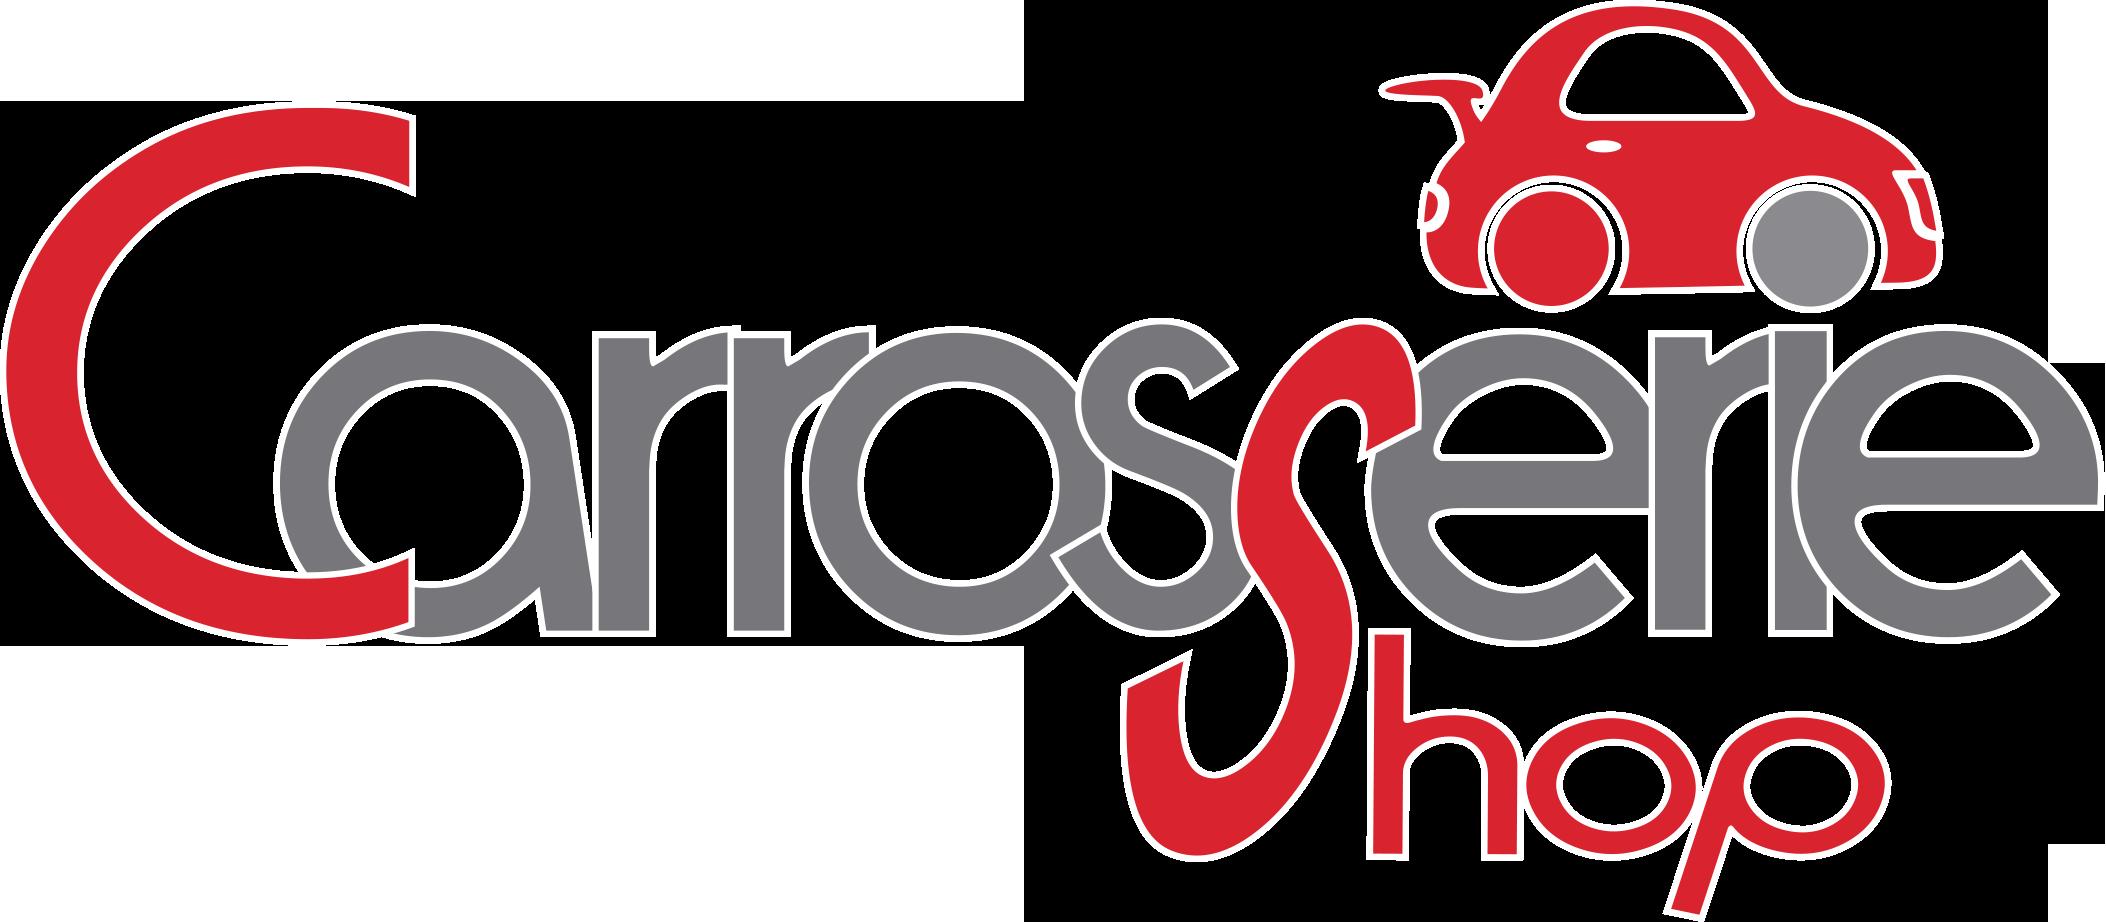 Carrosserie-Shop.ch SA